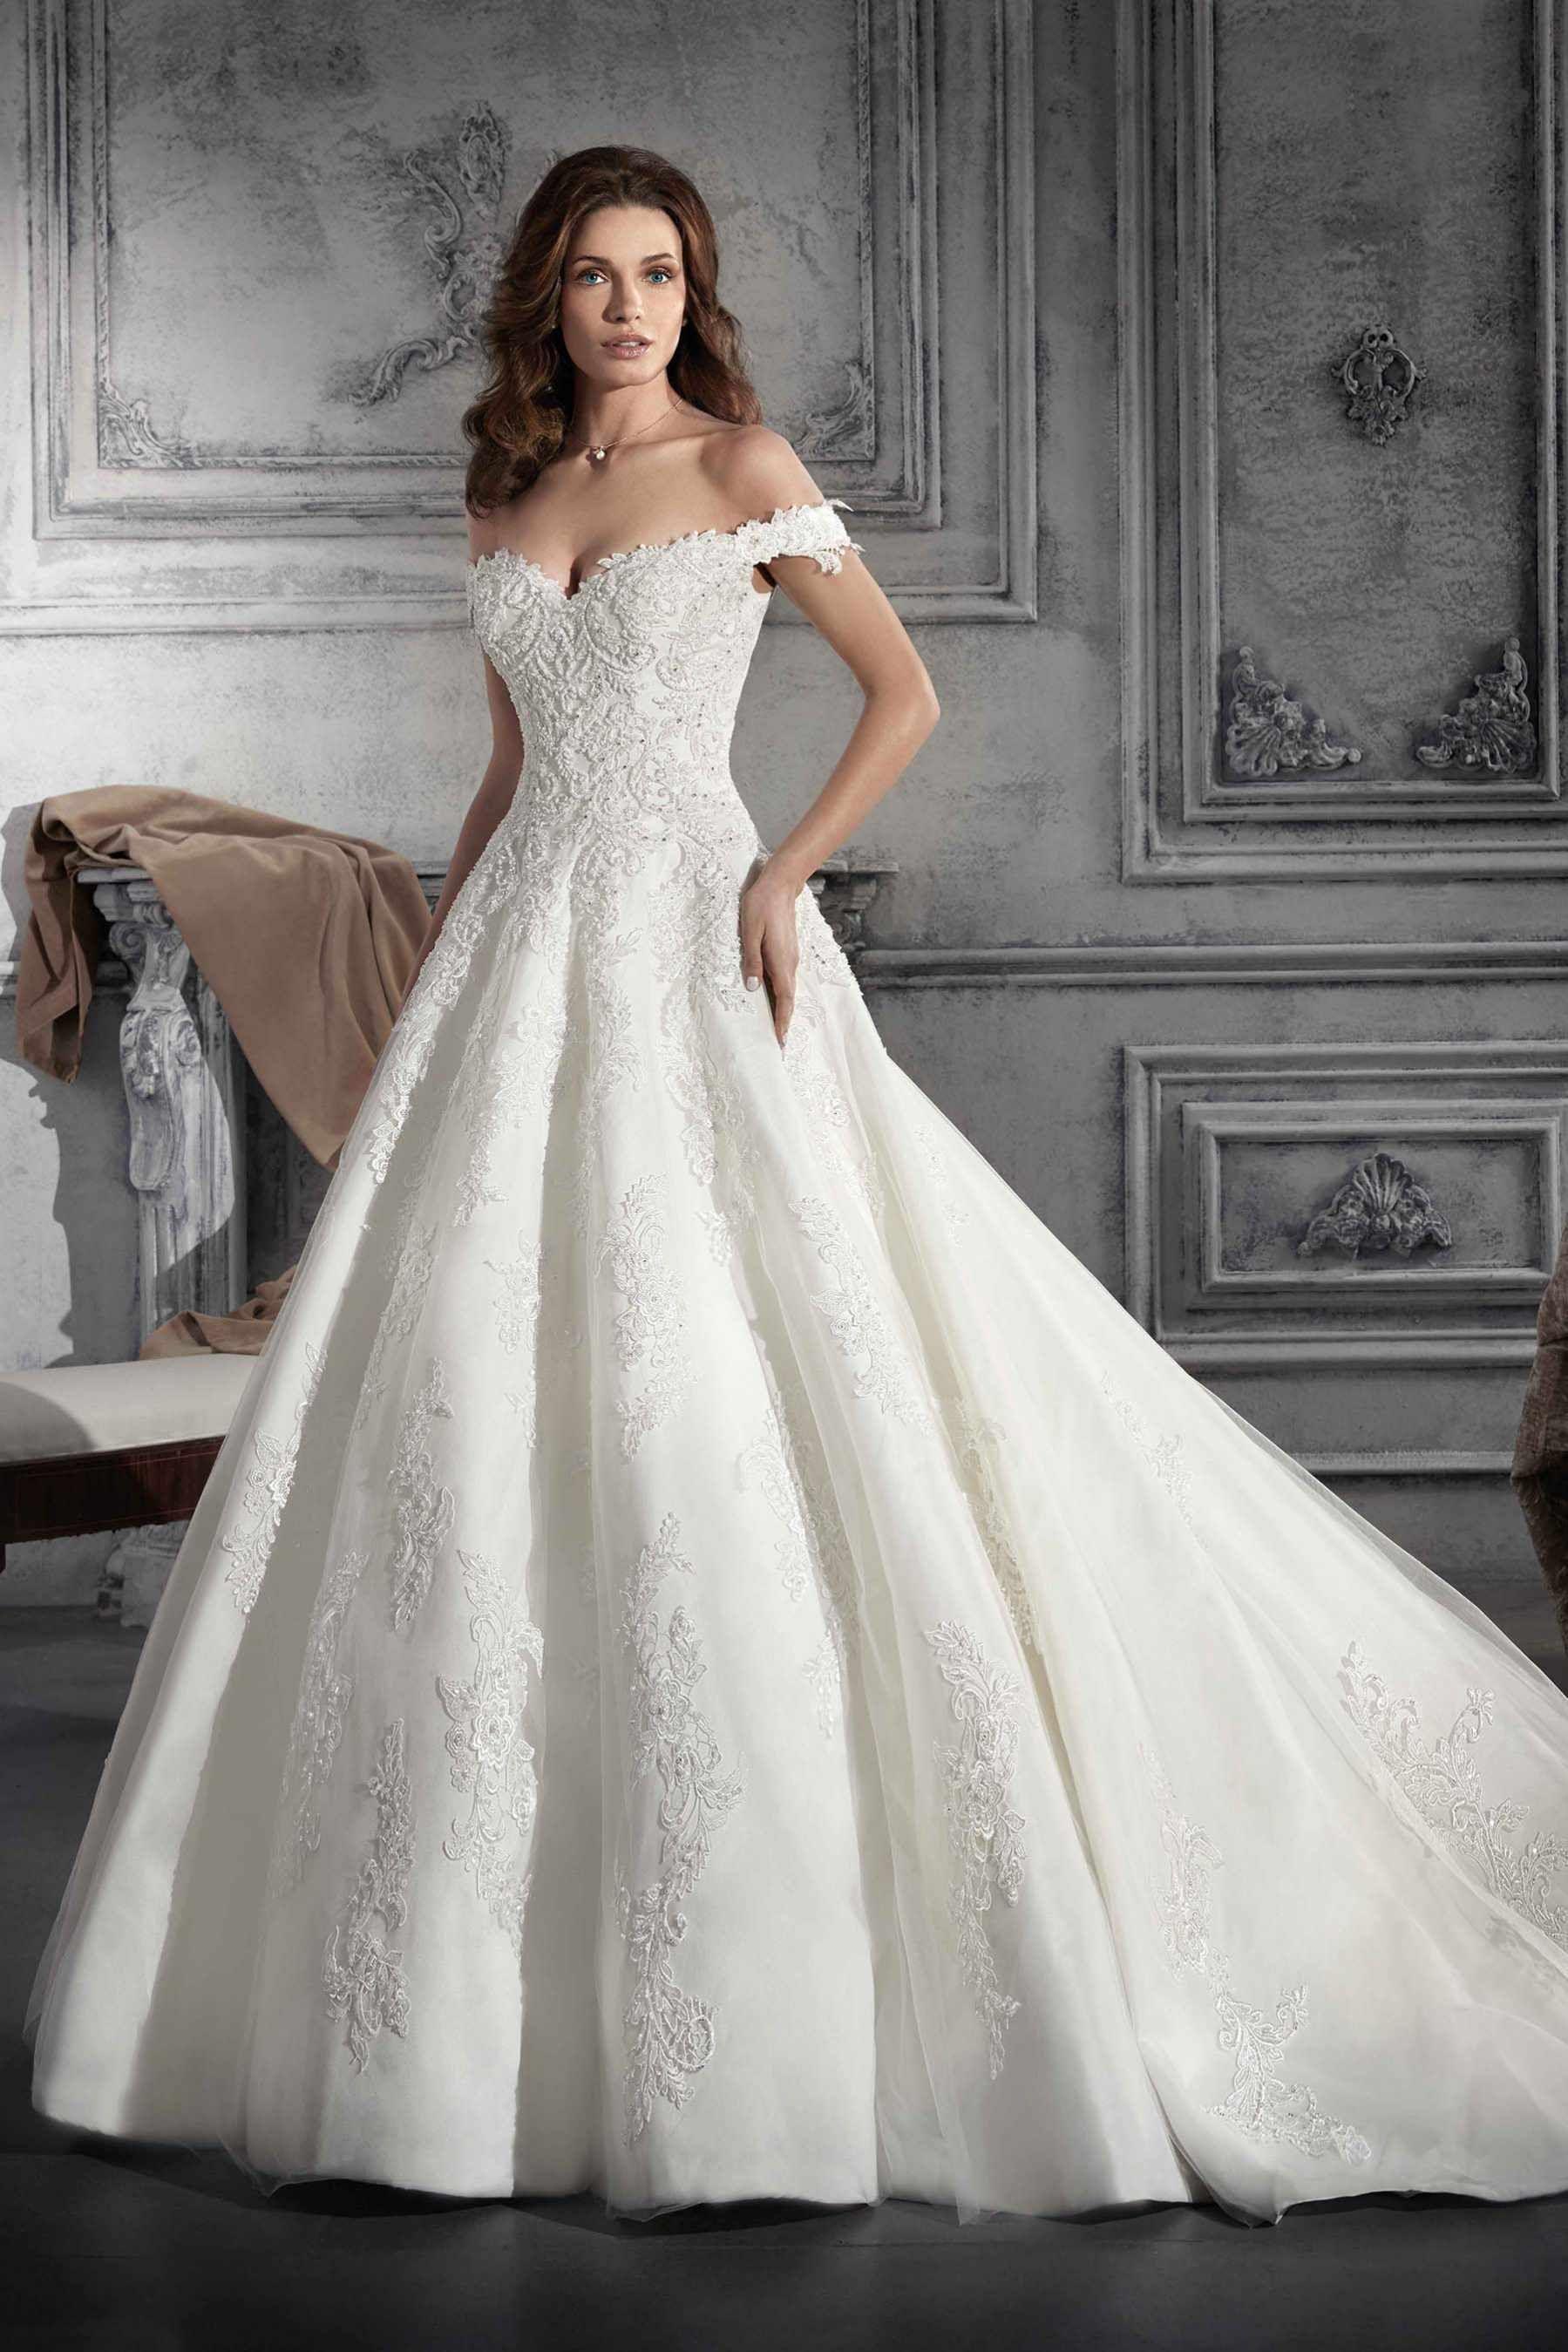 Demetrios wedding dress style for the grandest of romantic